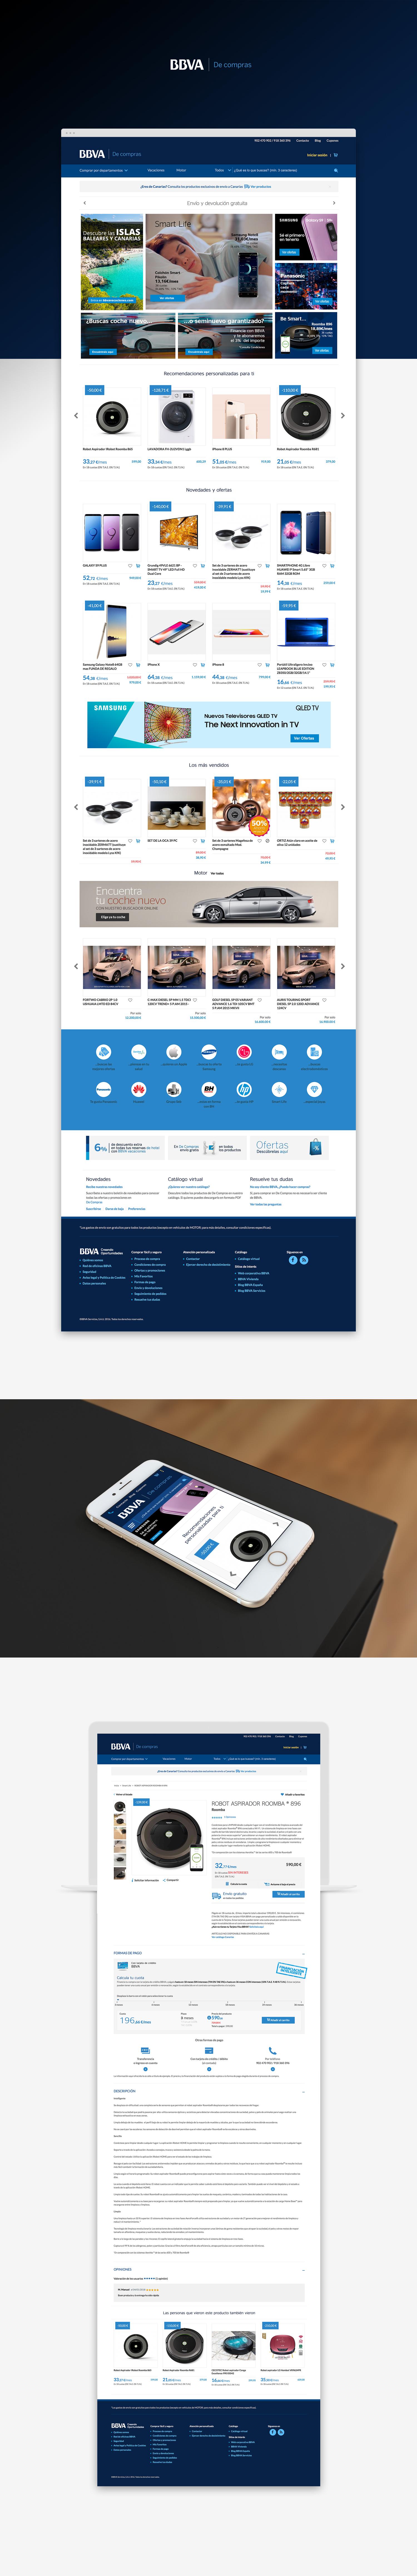 Diseño web responsive · BBVA De compras · Inés Donaire · diseñador freelance